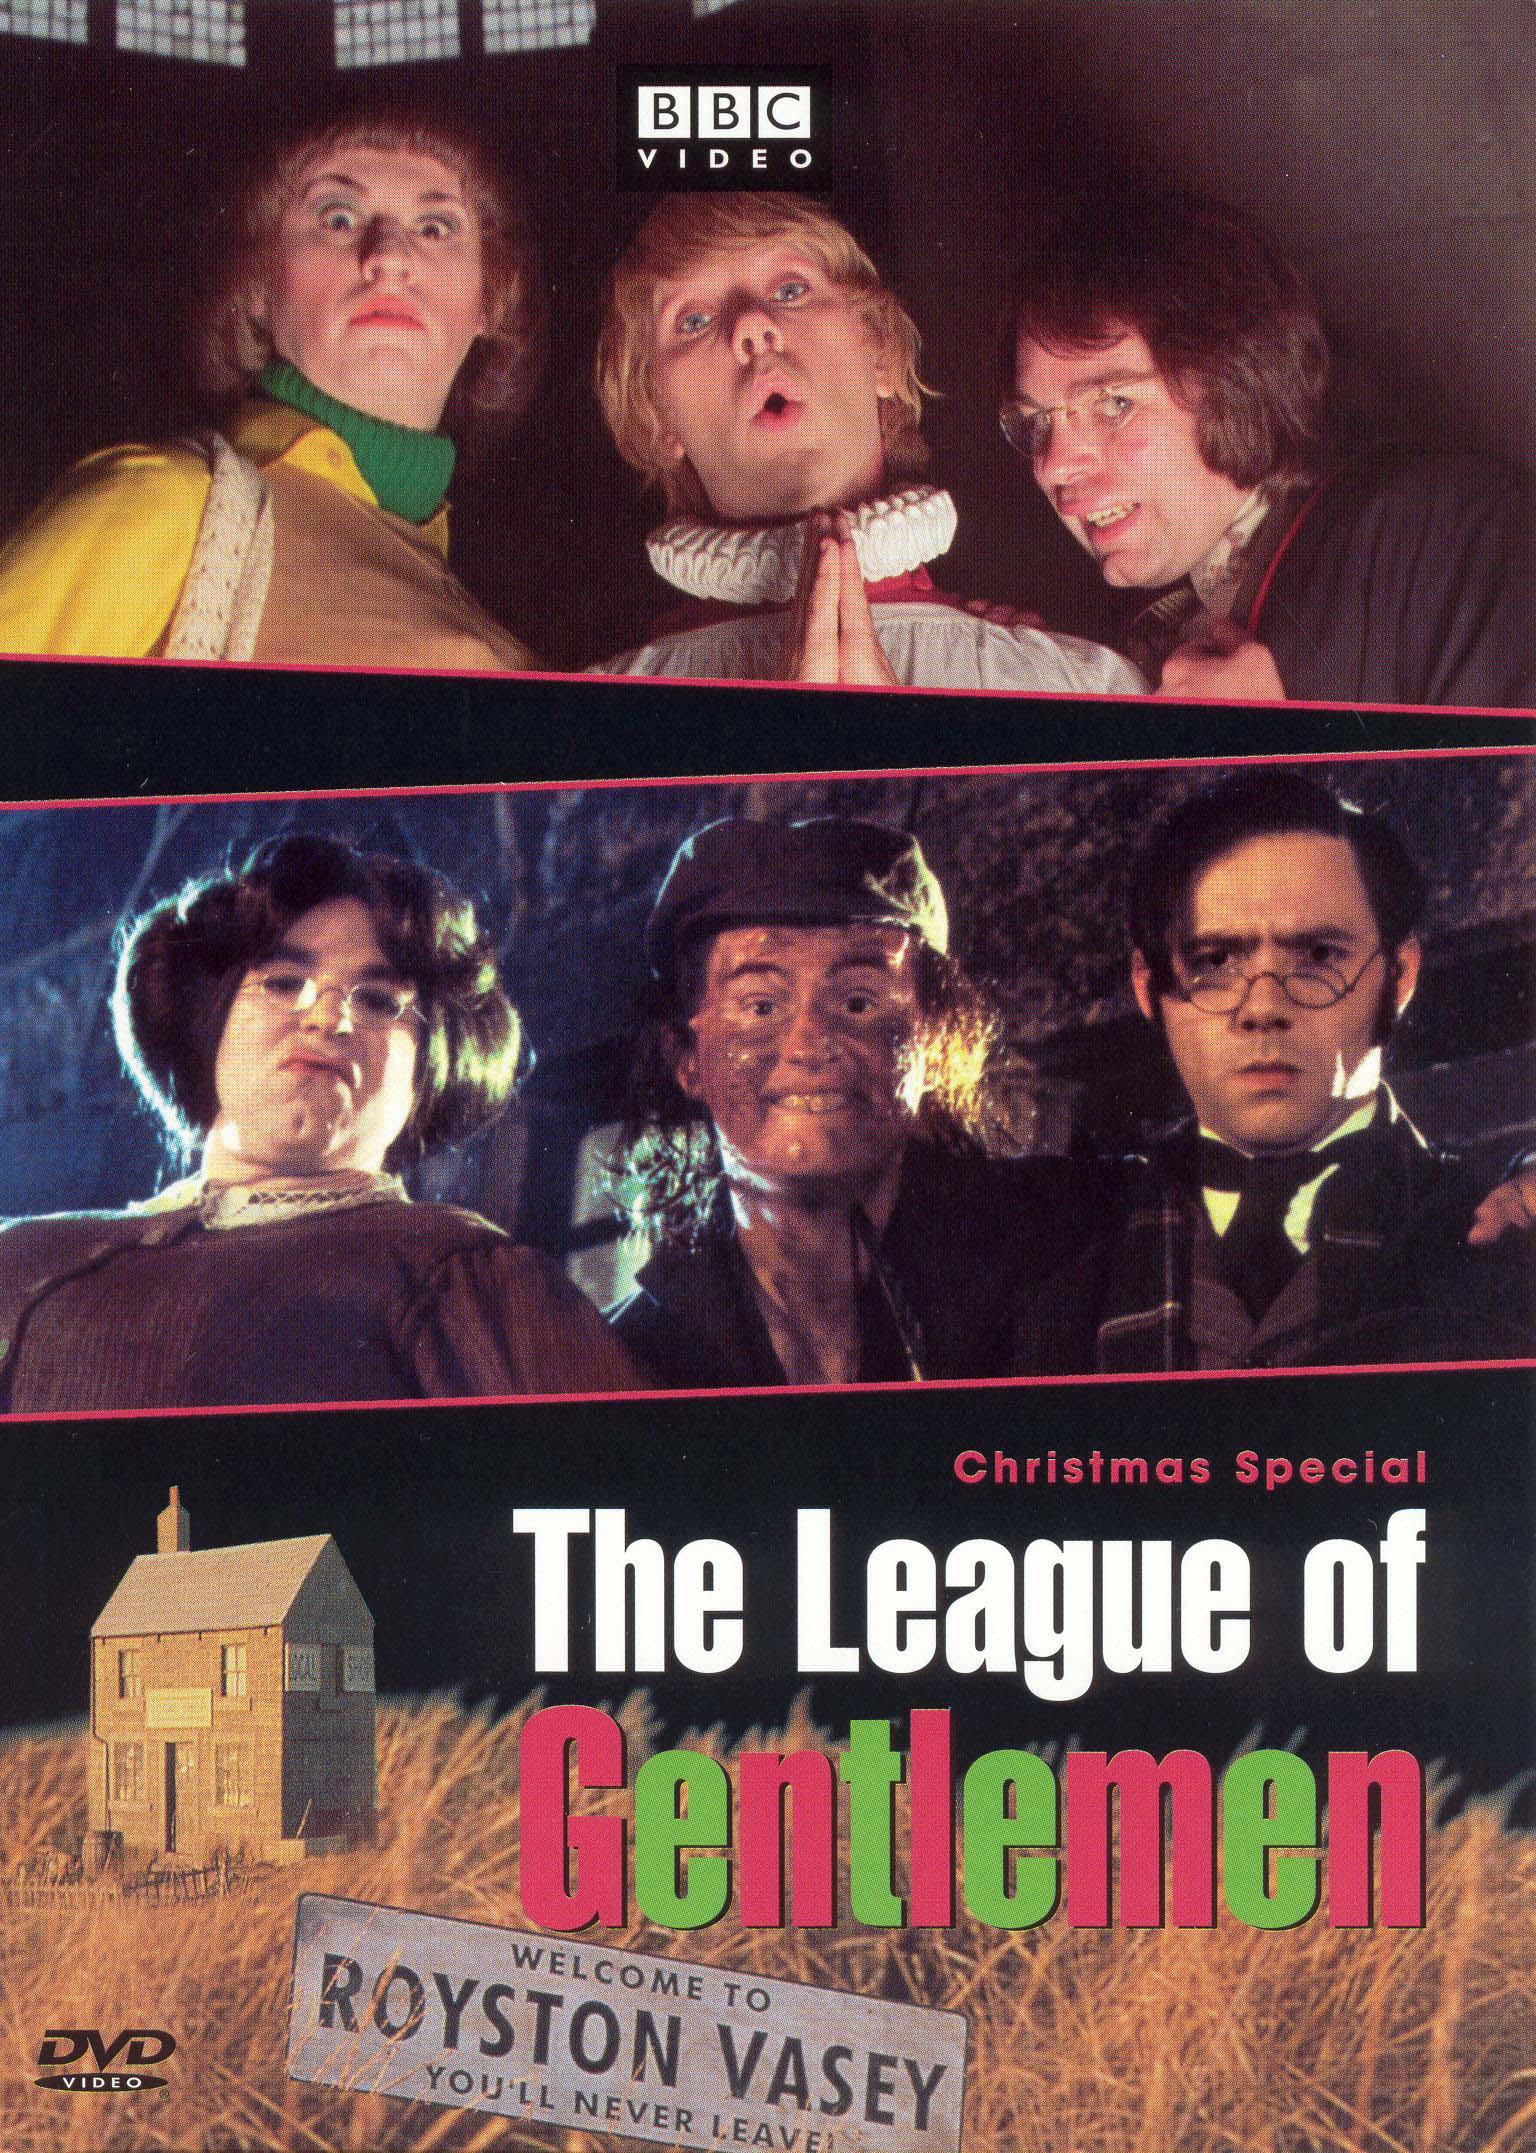 The League of Gentlemen: Christmas Special